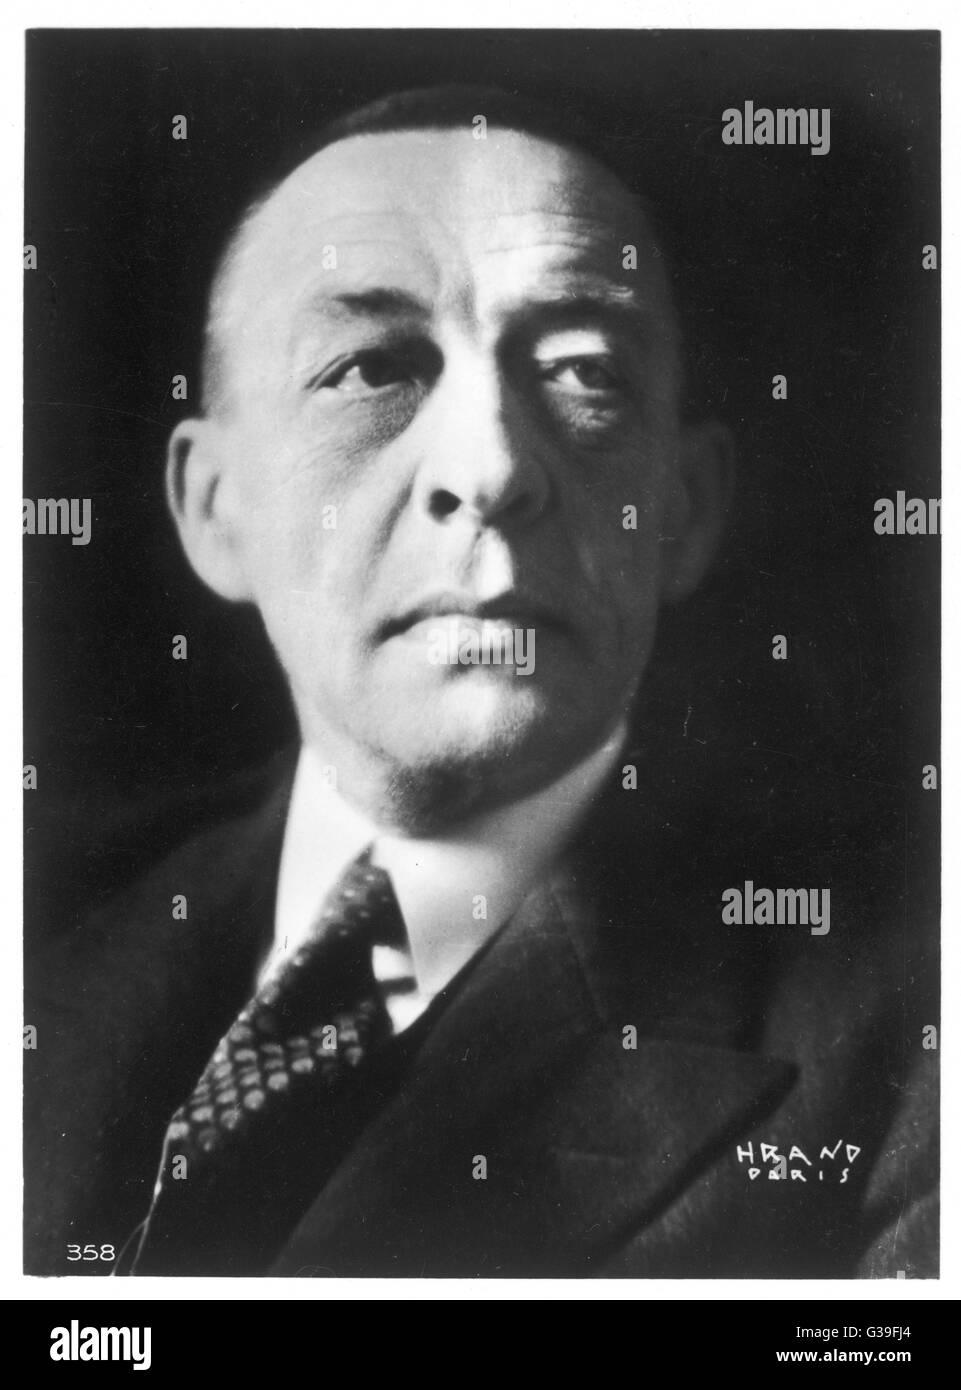 SERGEI RACHMANINOV  Russian musician        Date: 1873 - 1943 - Stock Image